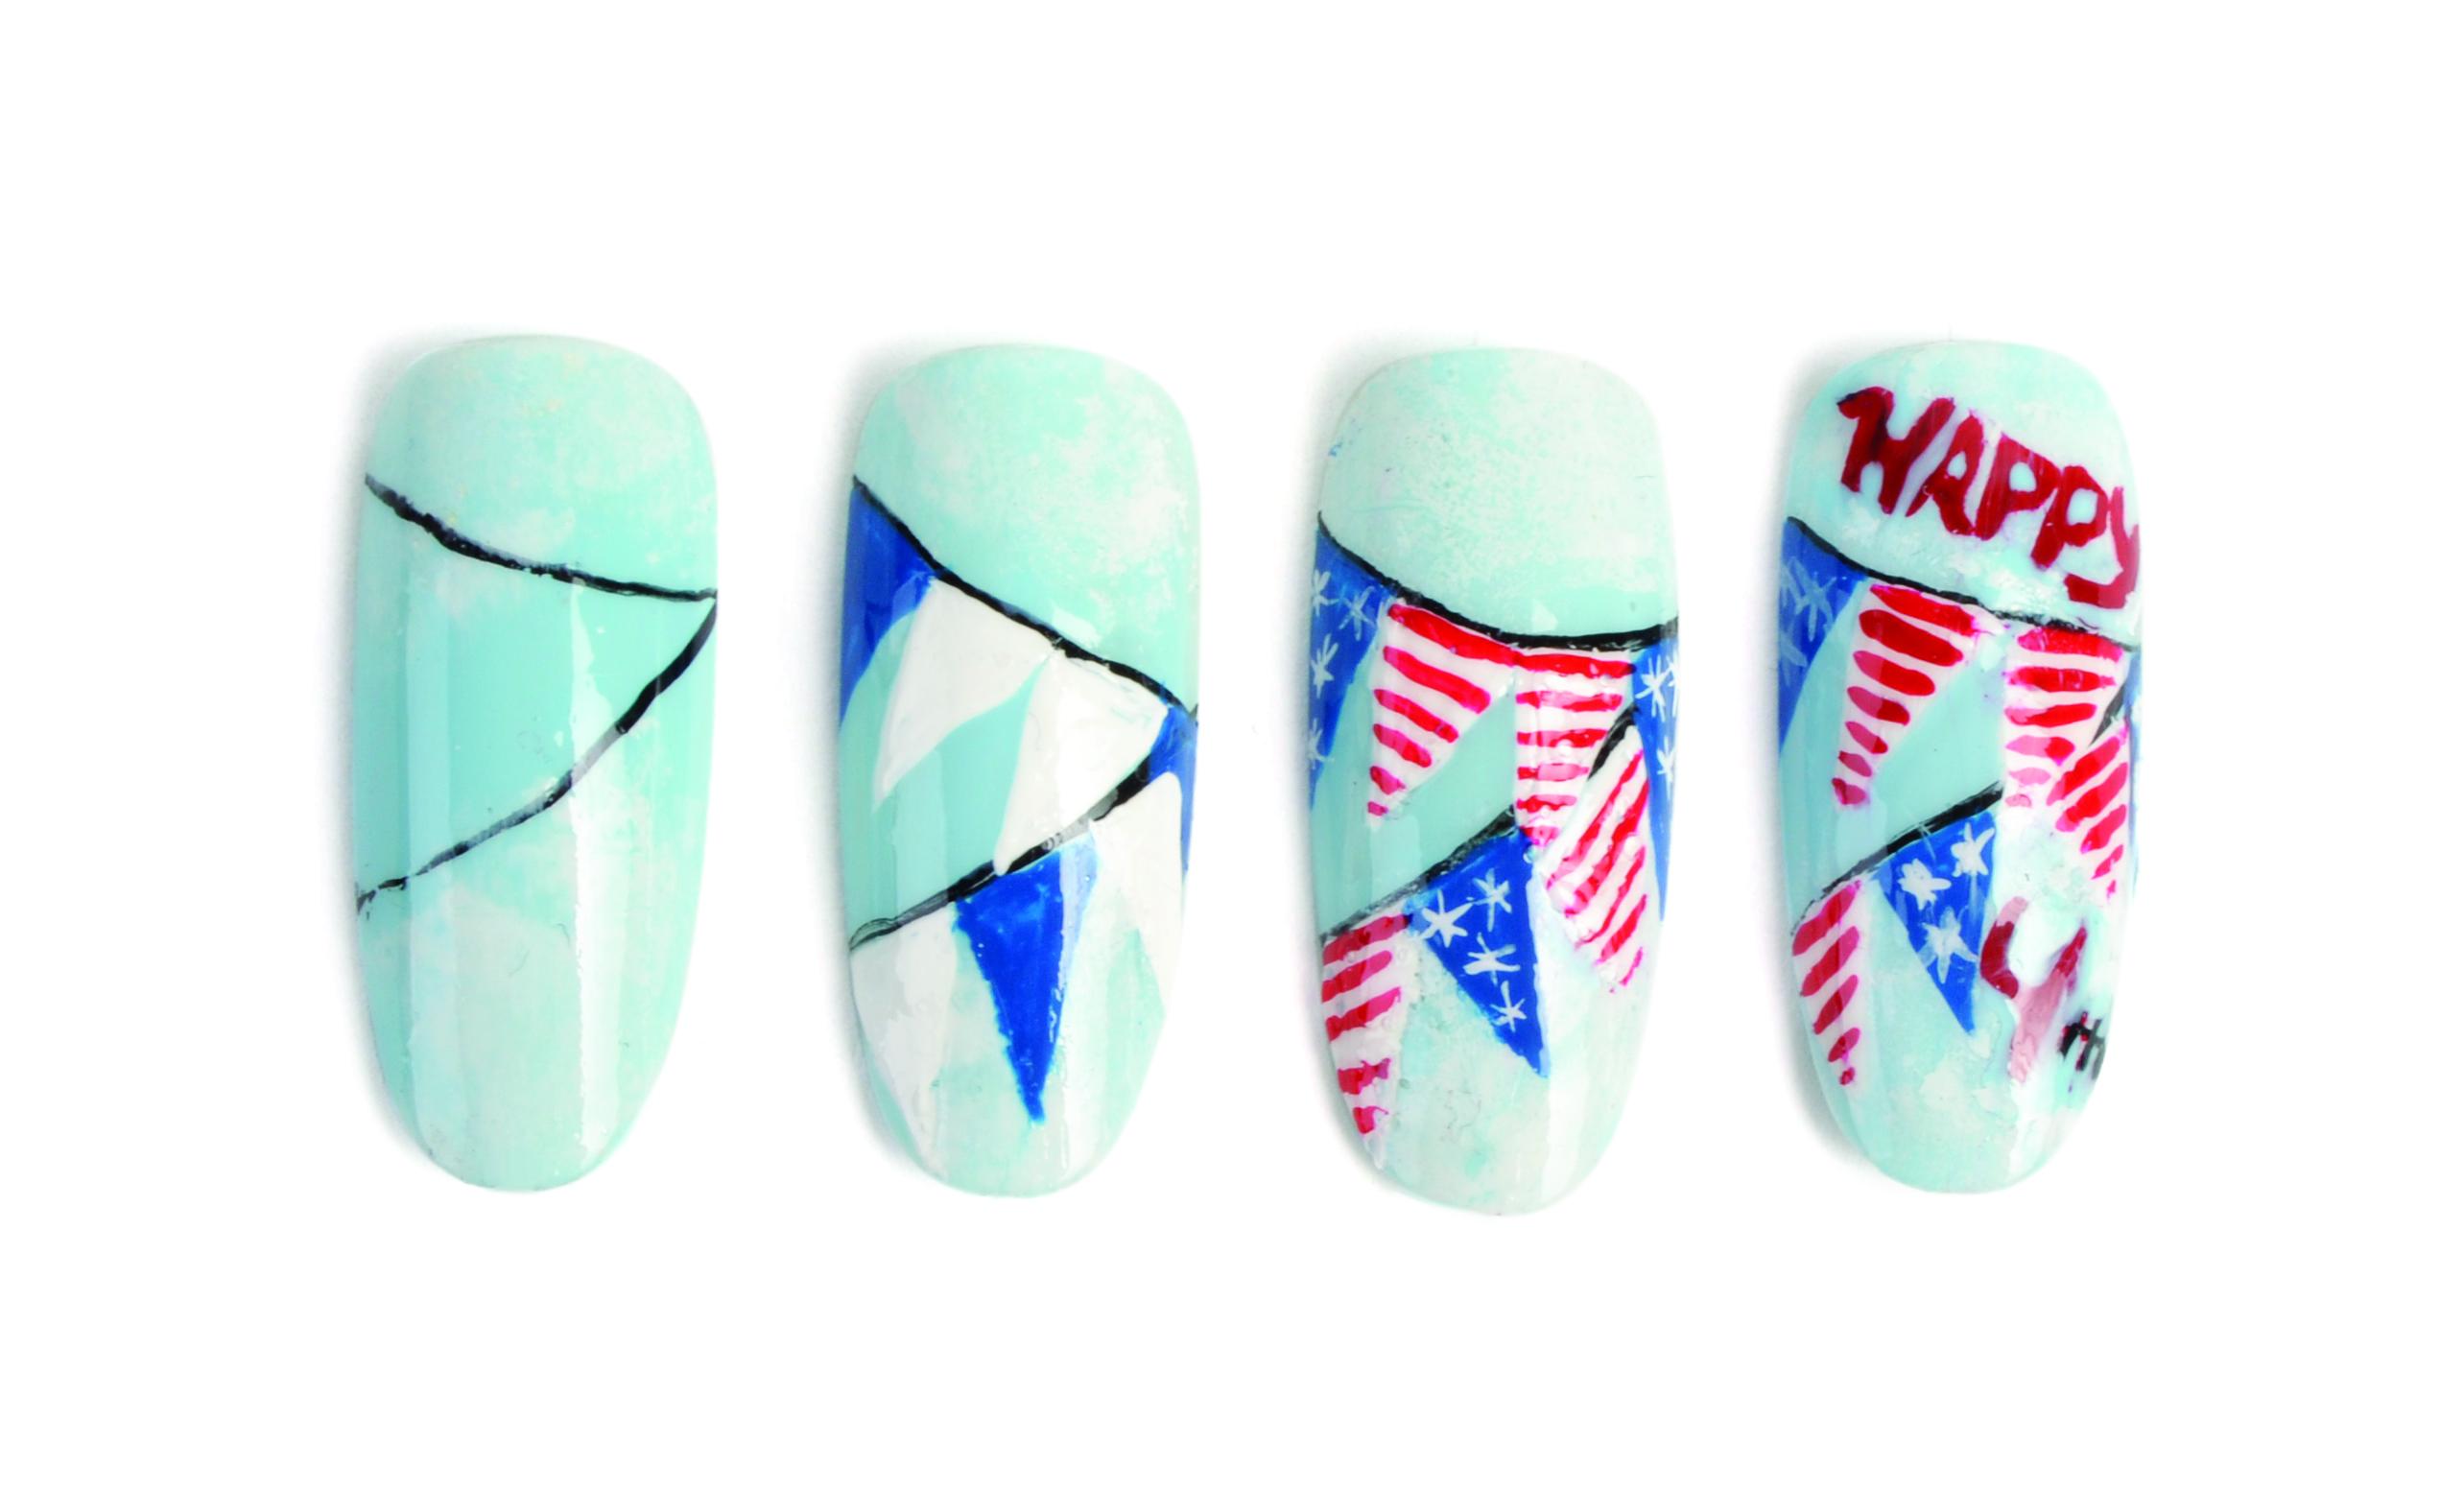 Nail Art Studio: Flags A-Flyin'